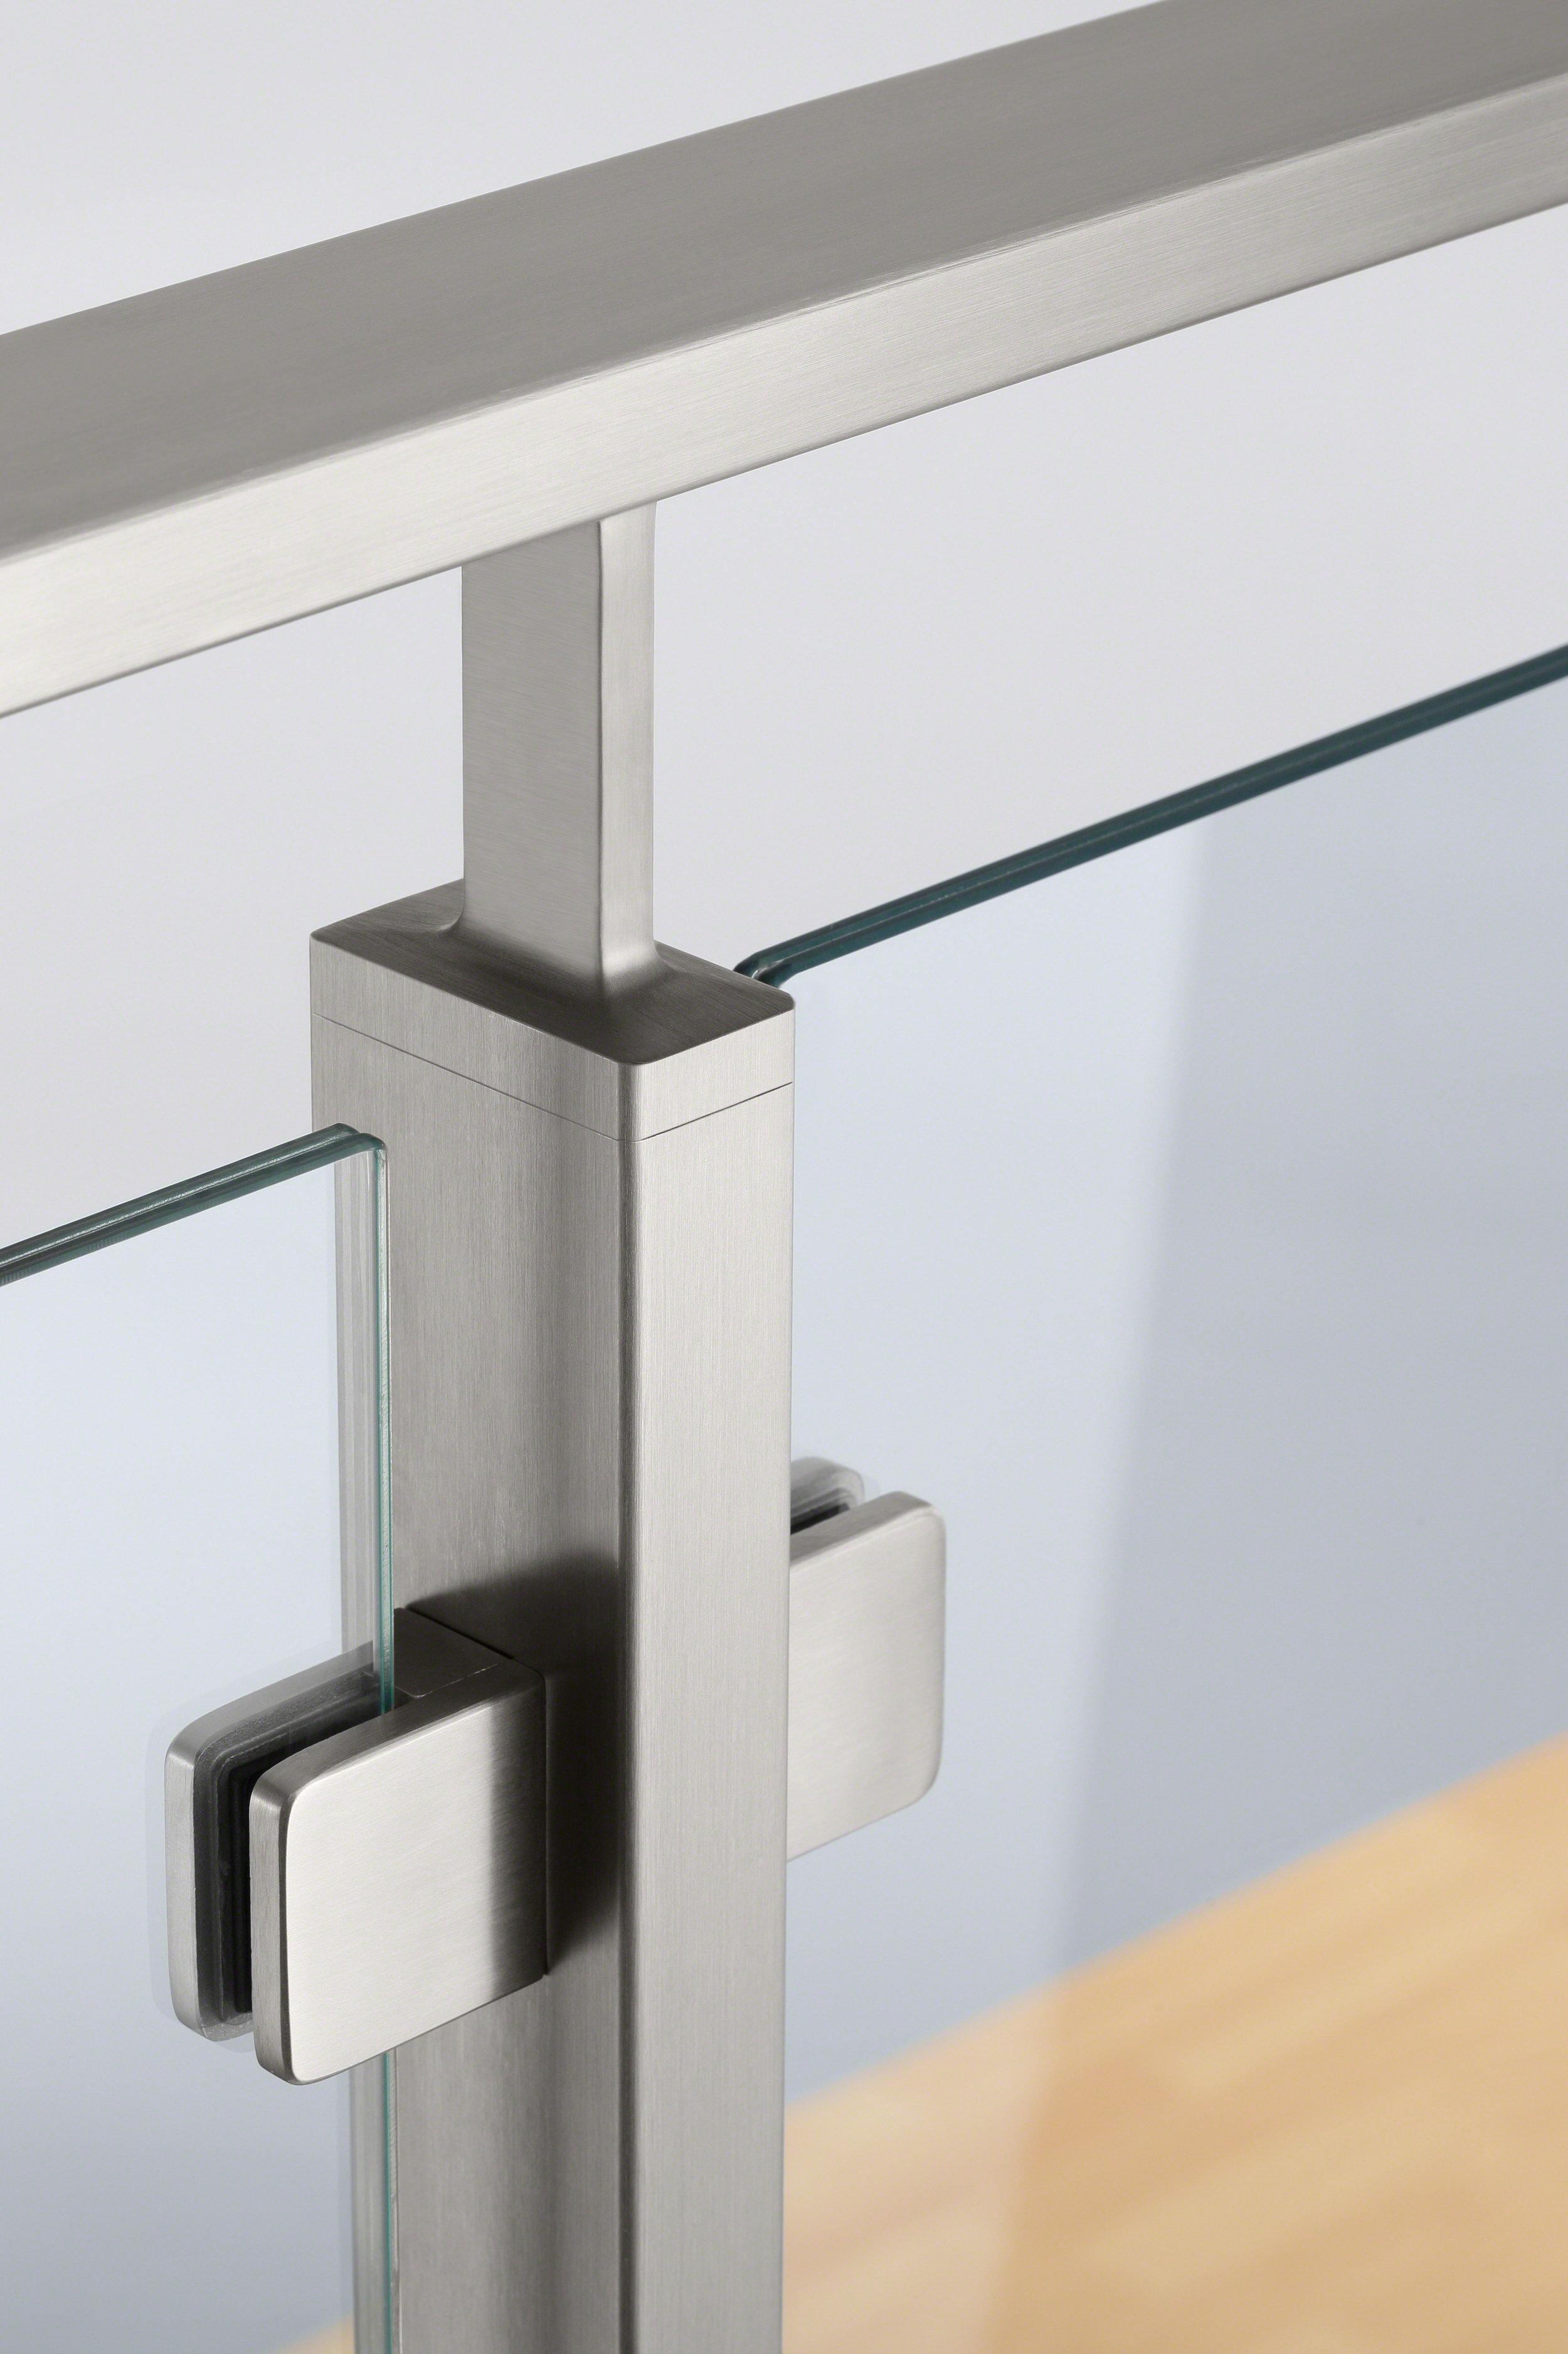 Oak Point_Stainless Steel_Glass Infill.jpg